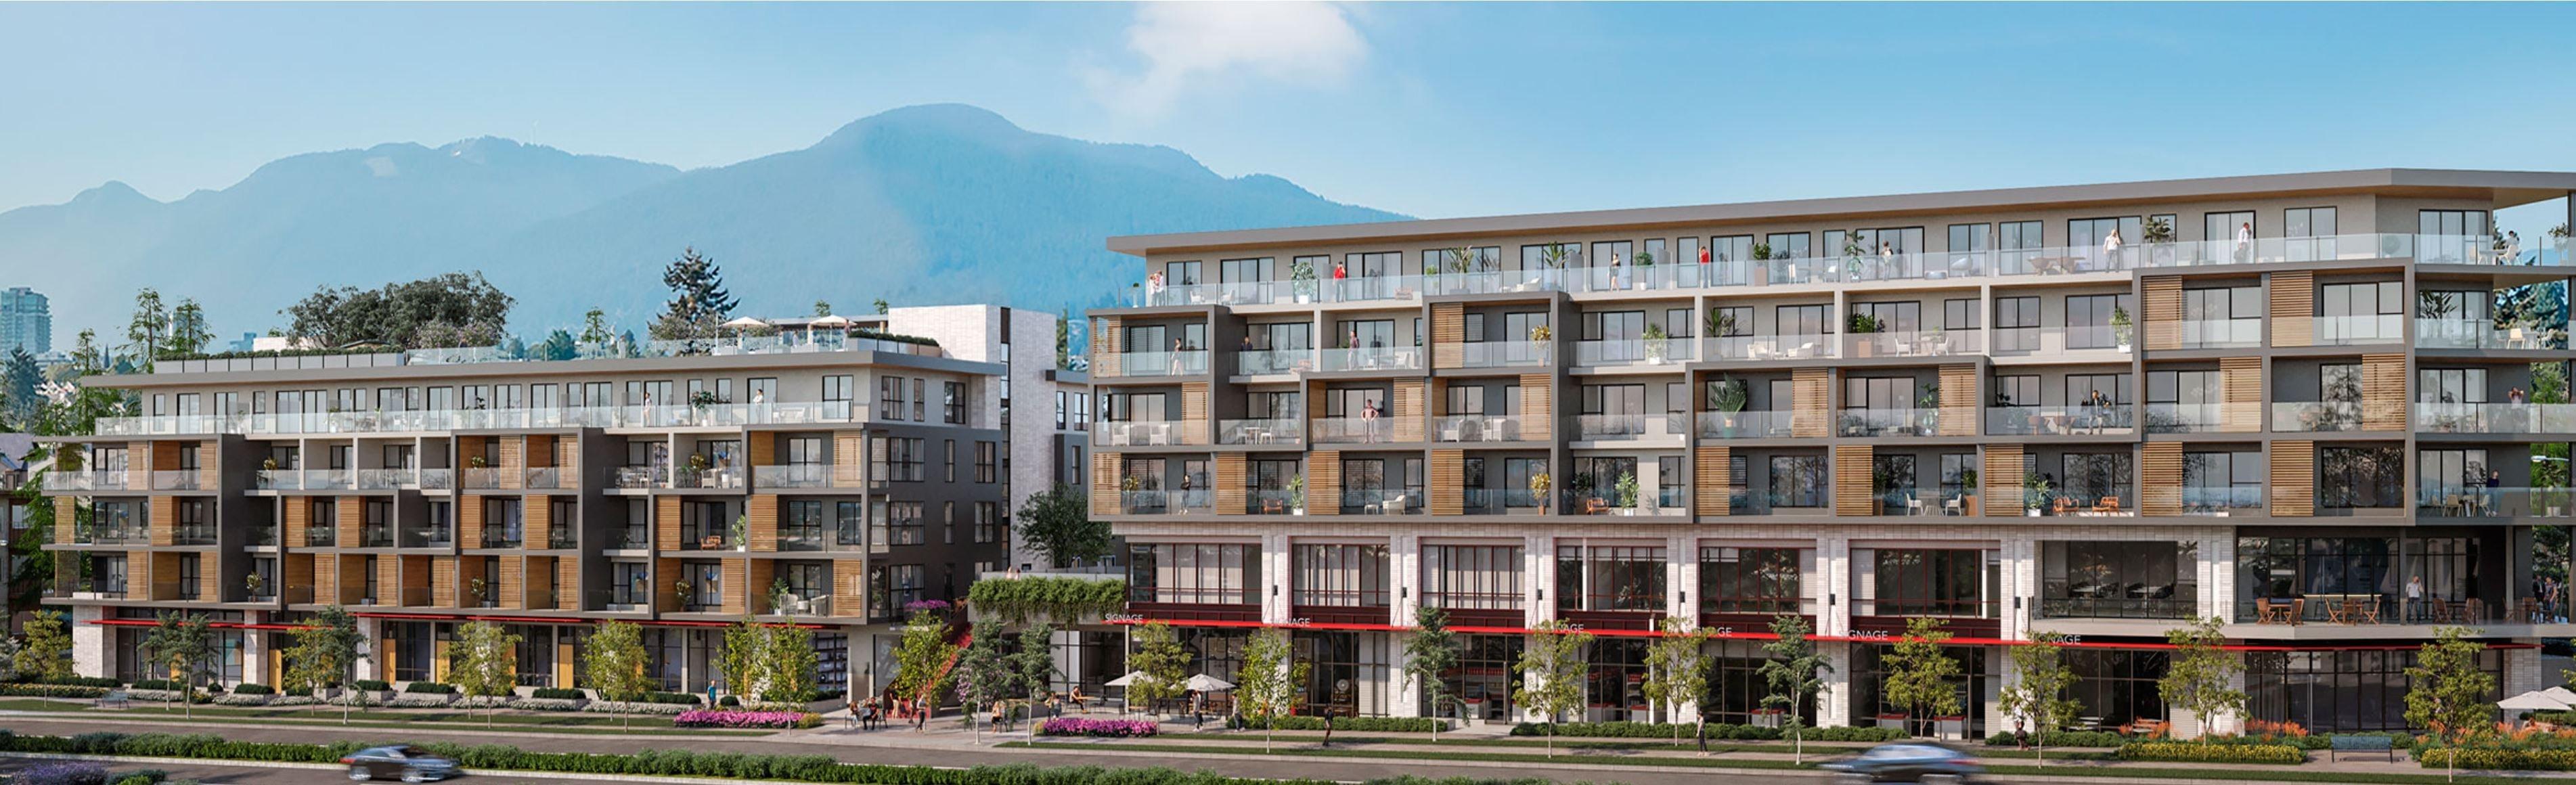 INNOVA - 402 East 3rd St -  by Cascadia Green Development!